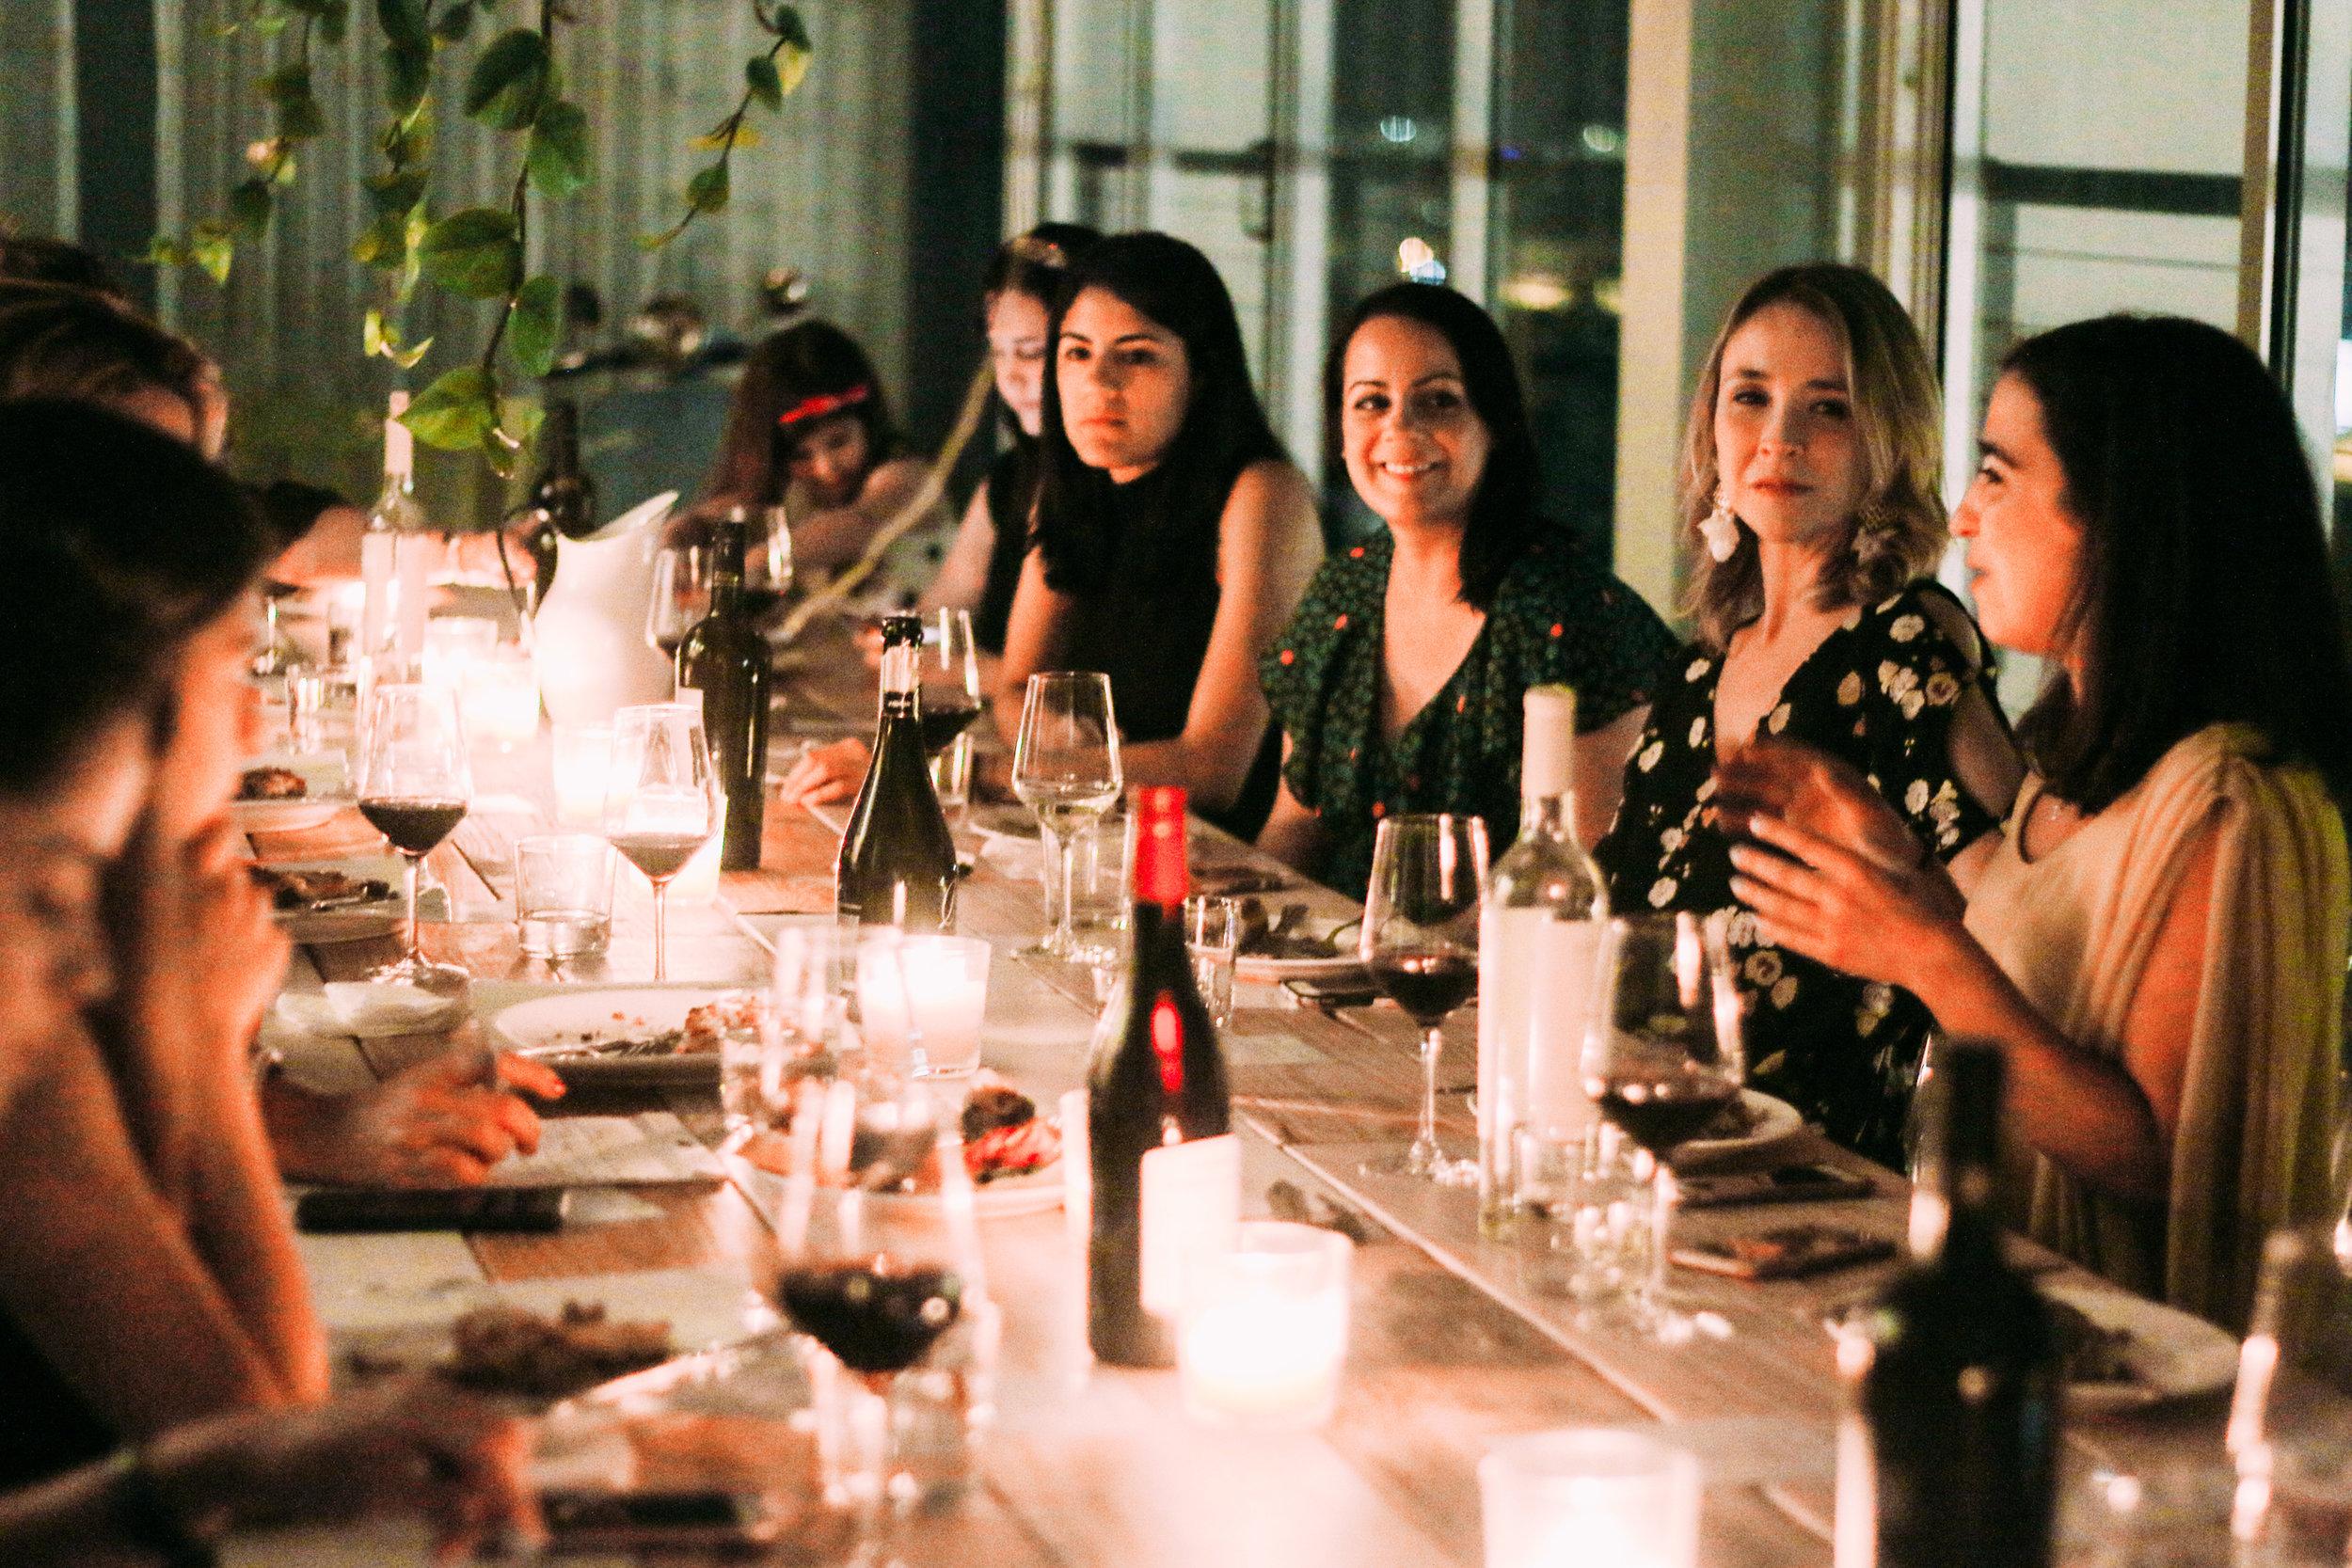 Women Who Wine Uncorked Conversations-Miami Wine Events-Wine Tasting Miami-70.jpg